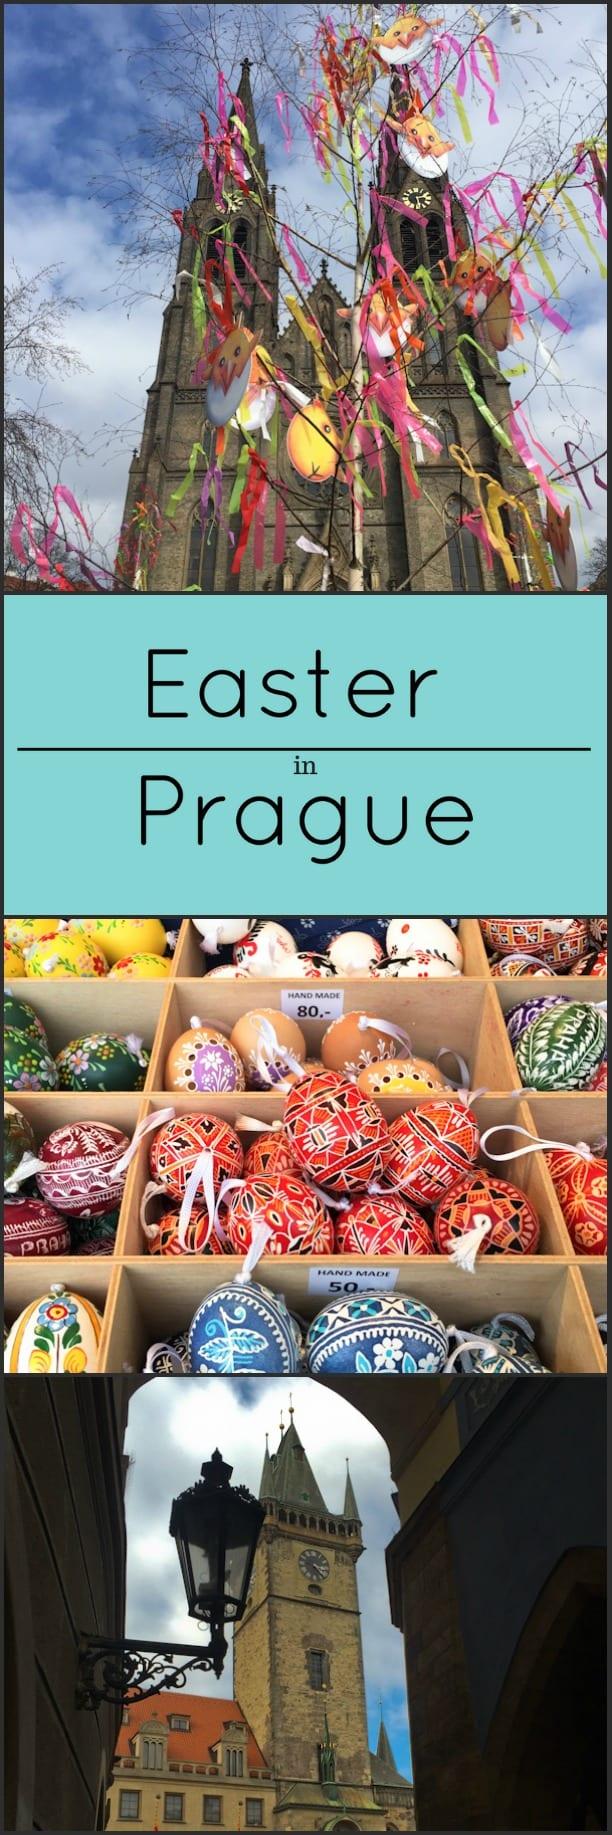 Easter in Prague, Czech Republic.